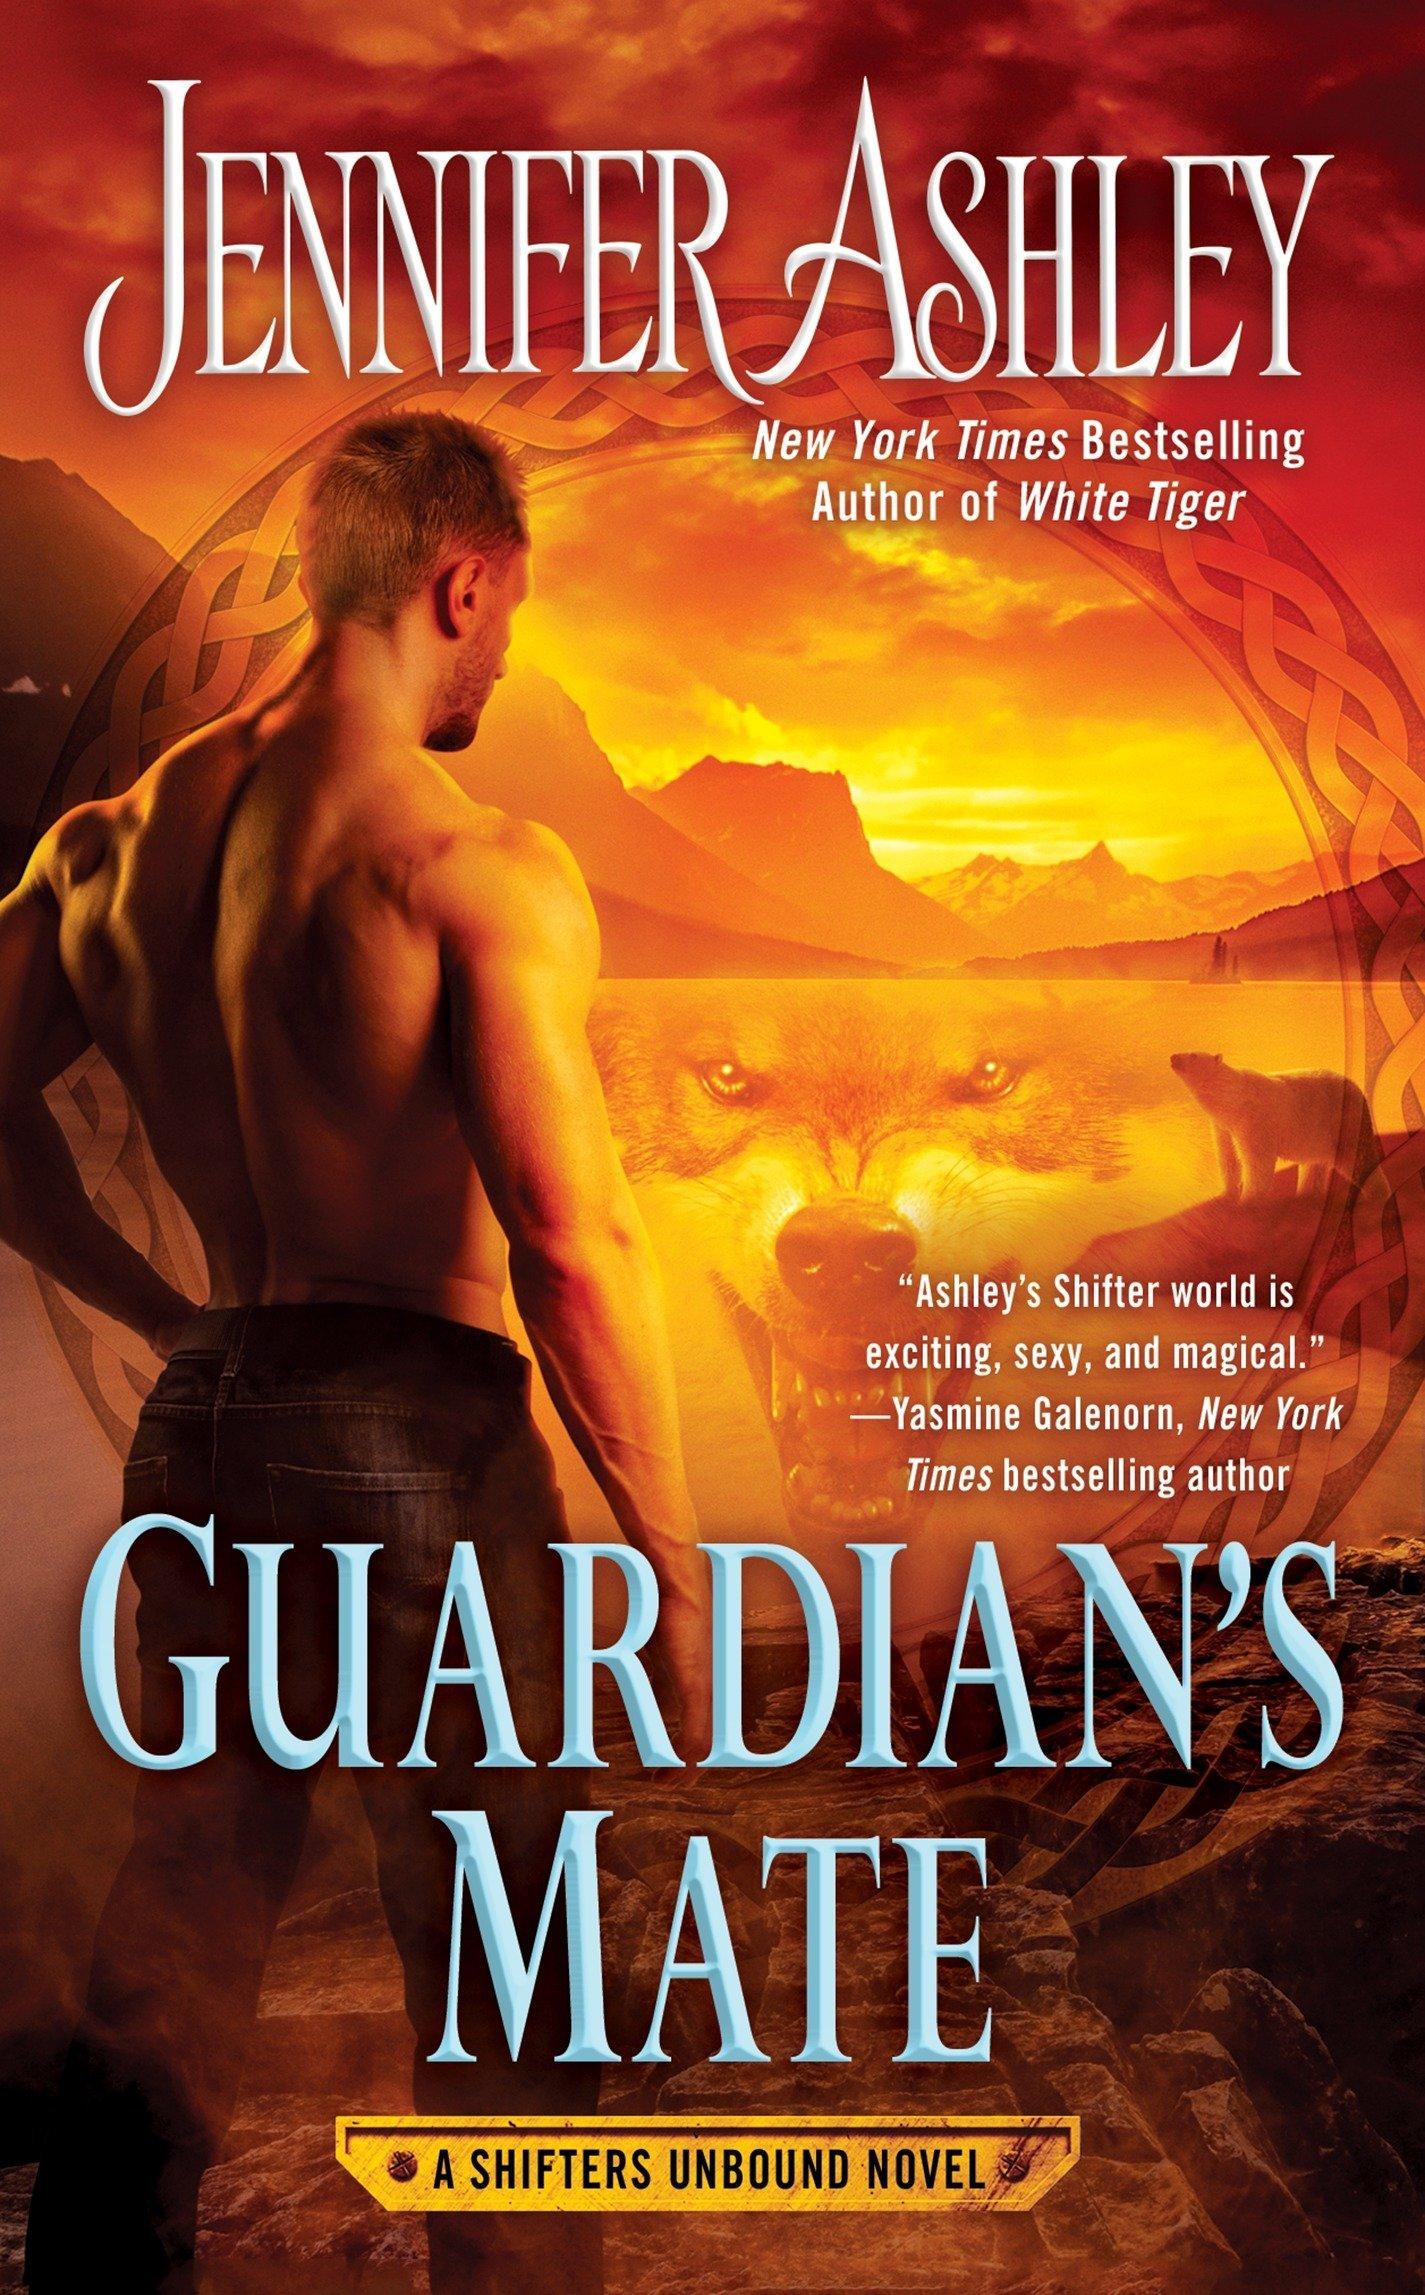 Read Online Guardian's Mate (A Shifters Unbound Novel) pdf epub